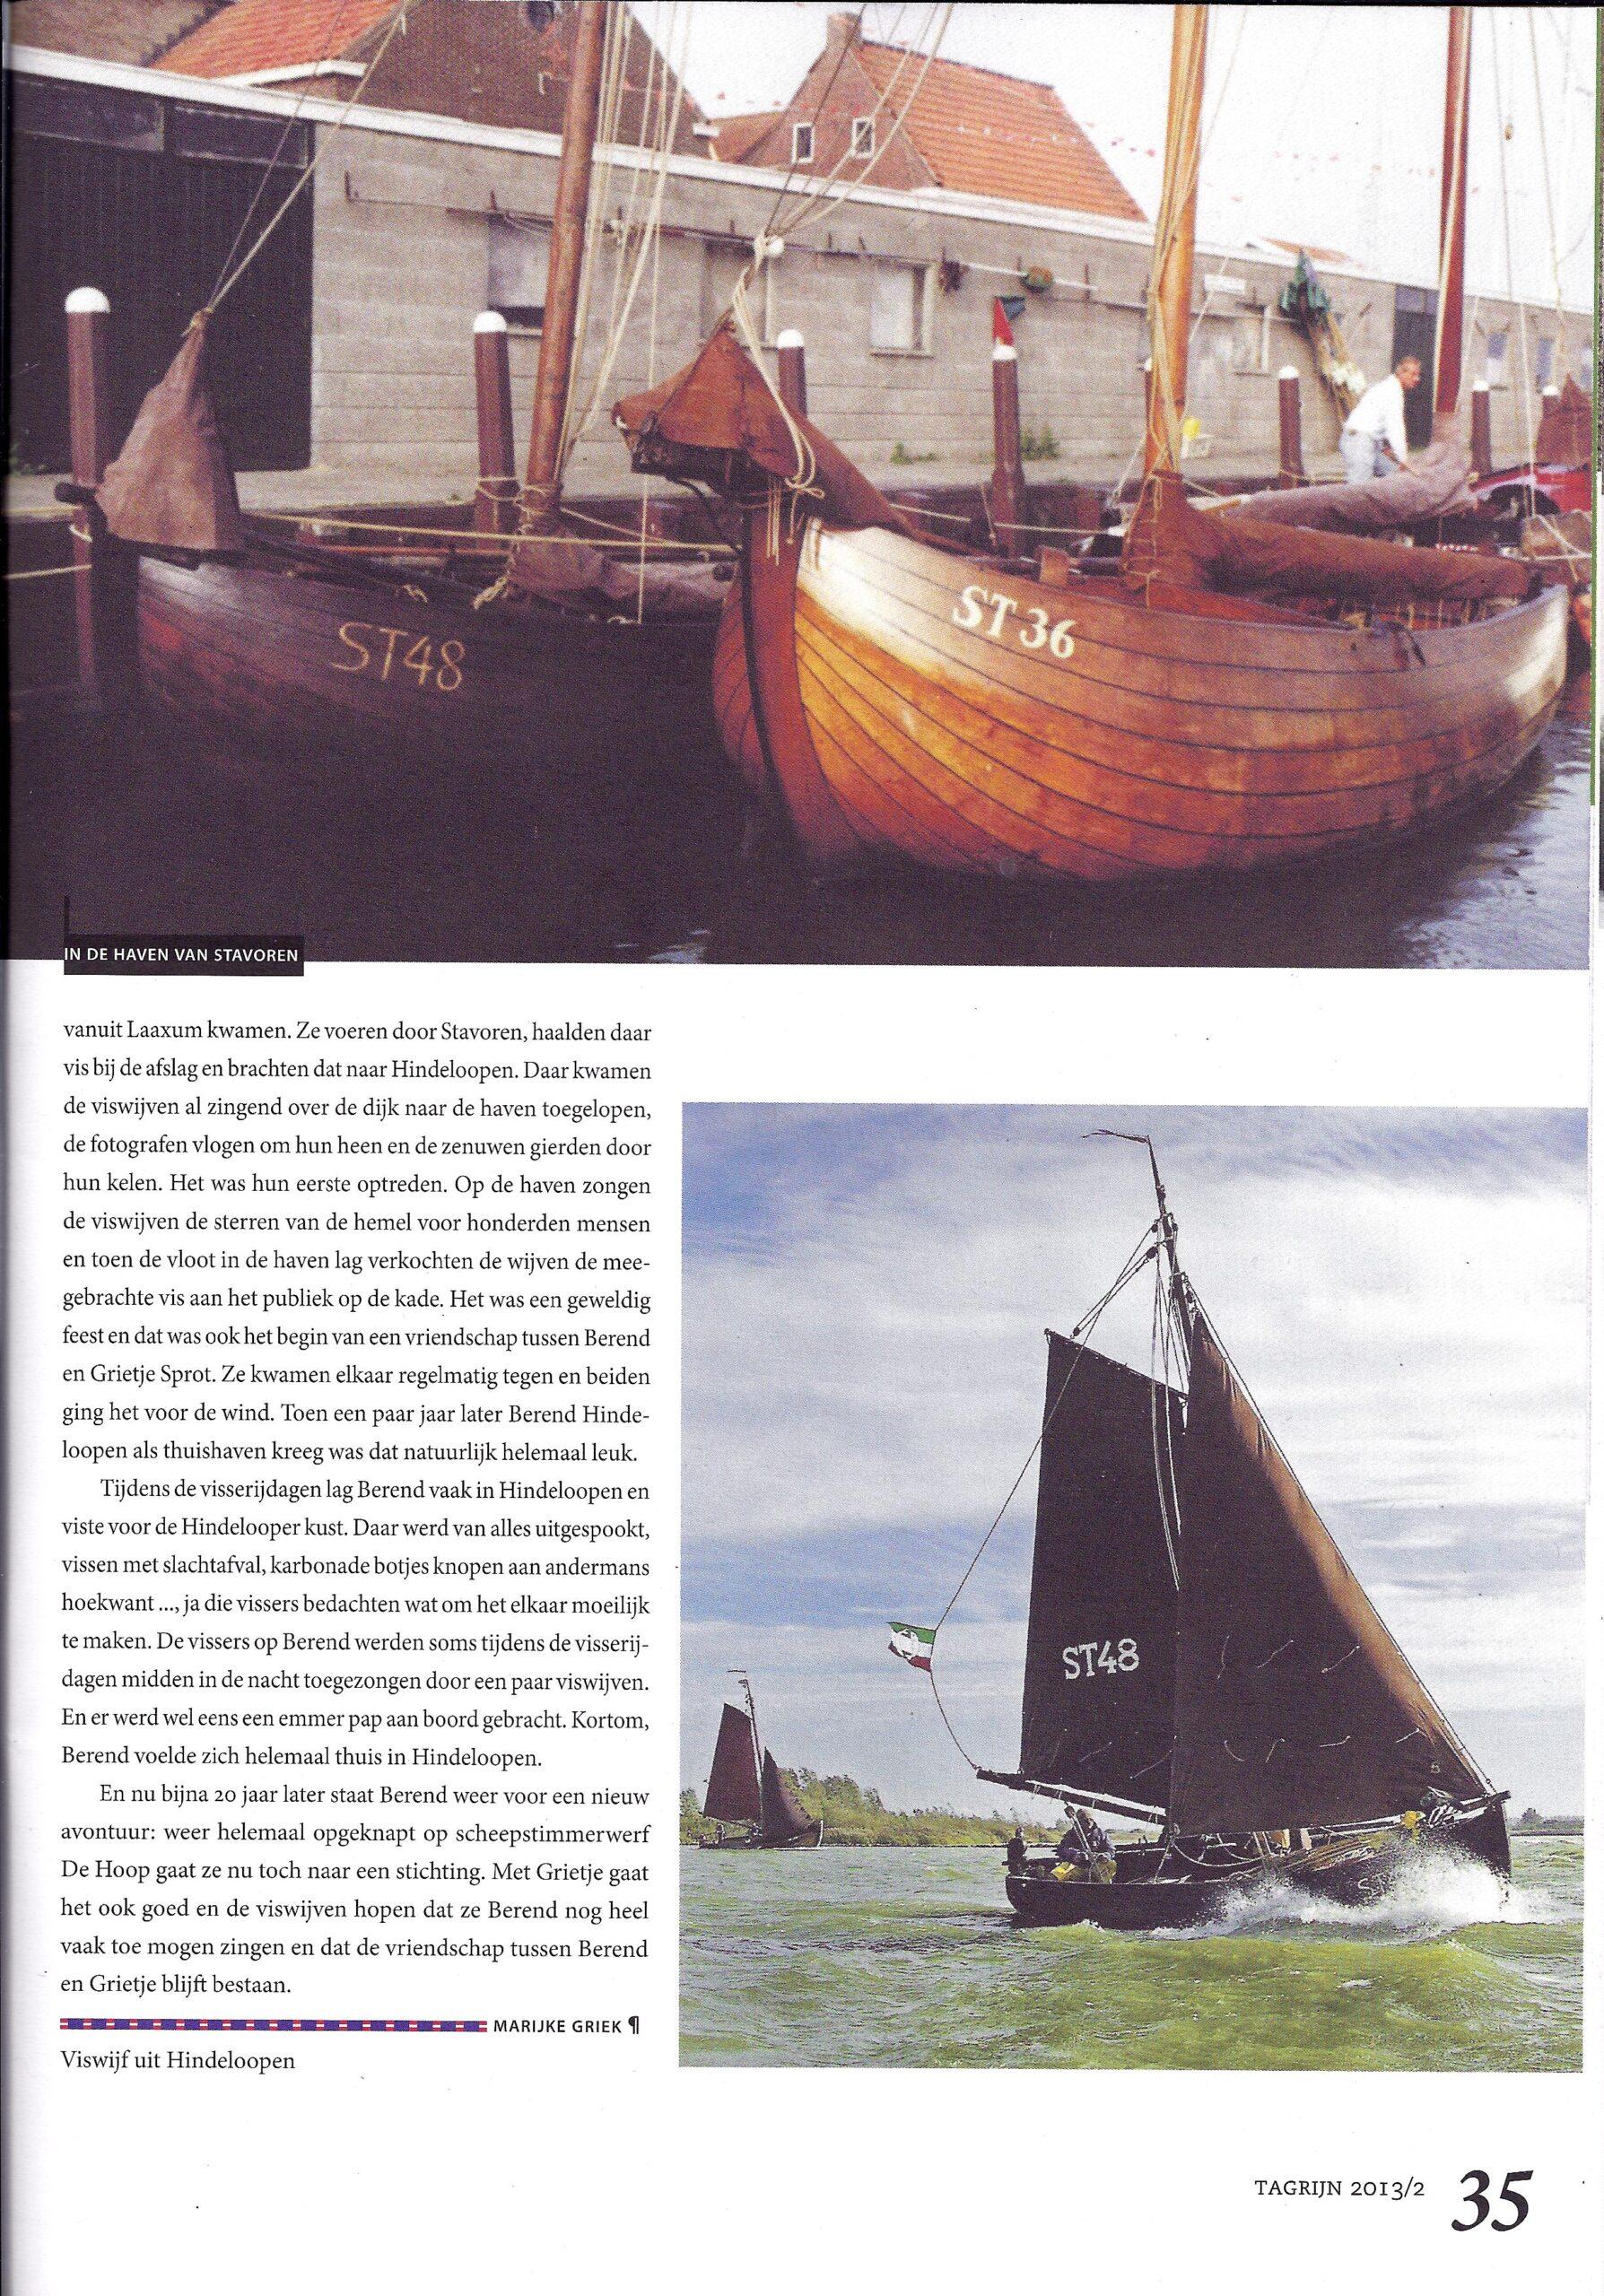 Tagrijn 2013 |tewaterlating ST48 | Pagina 4.